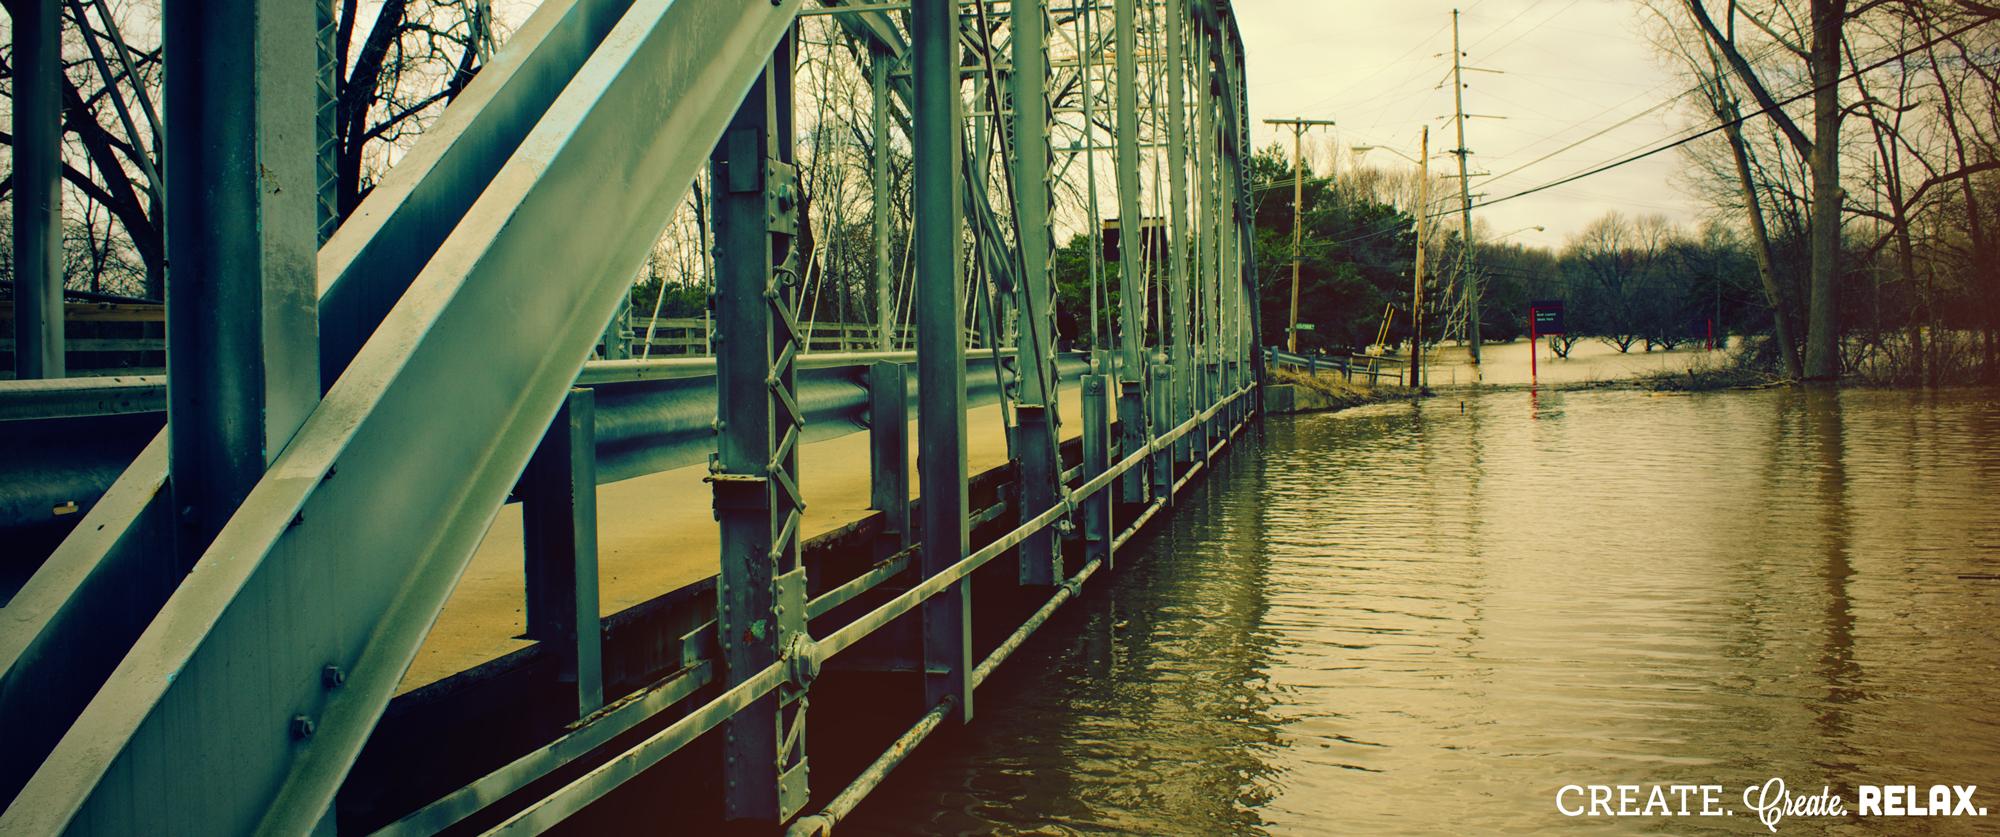 Emerson Park Bridge, Midland, MI